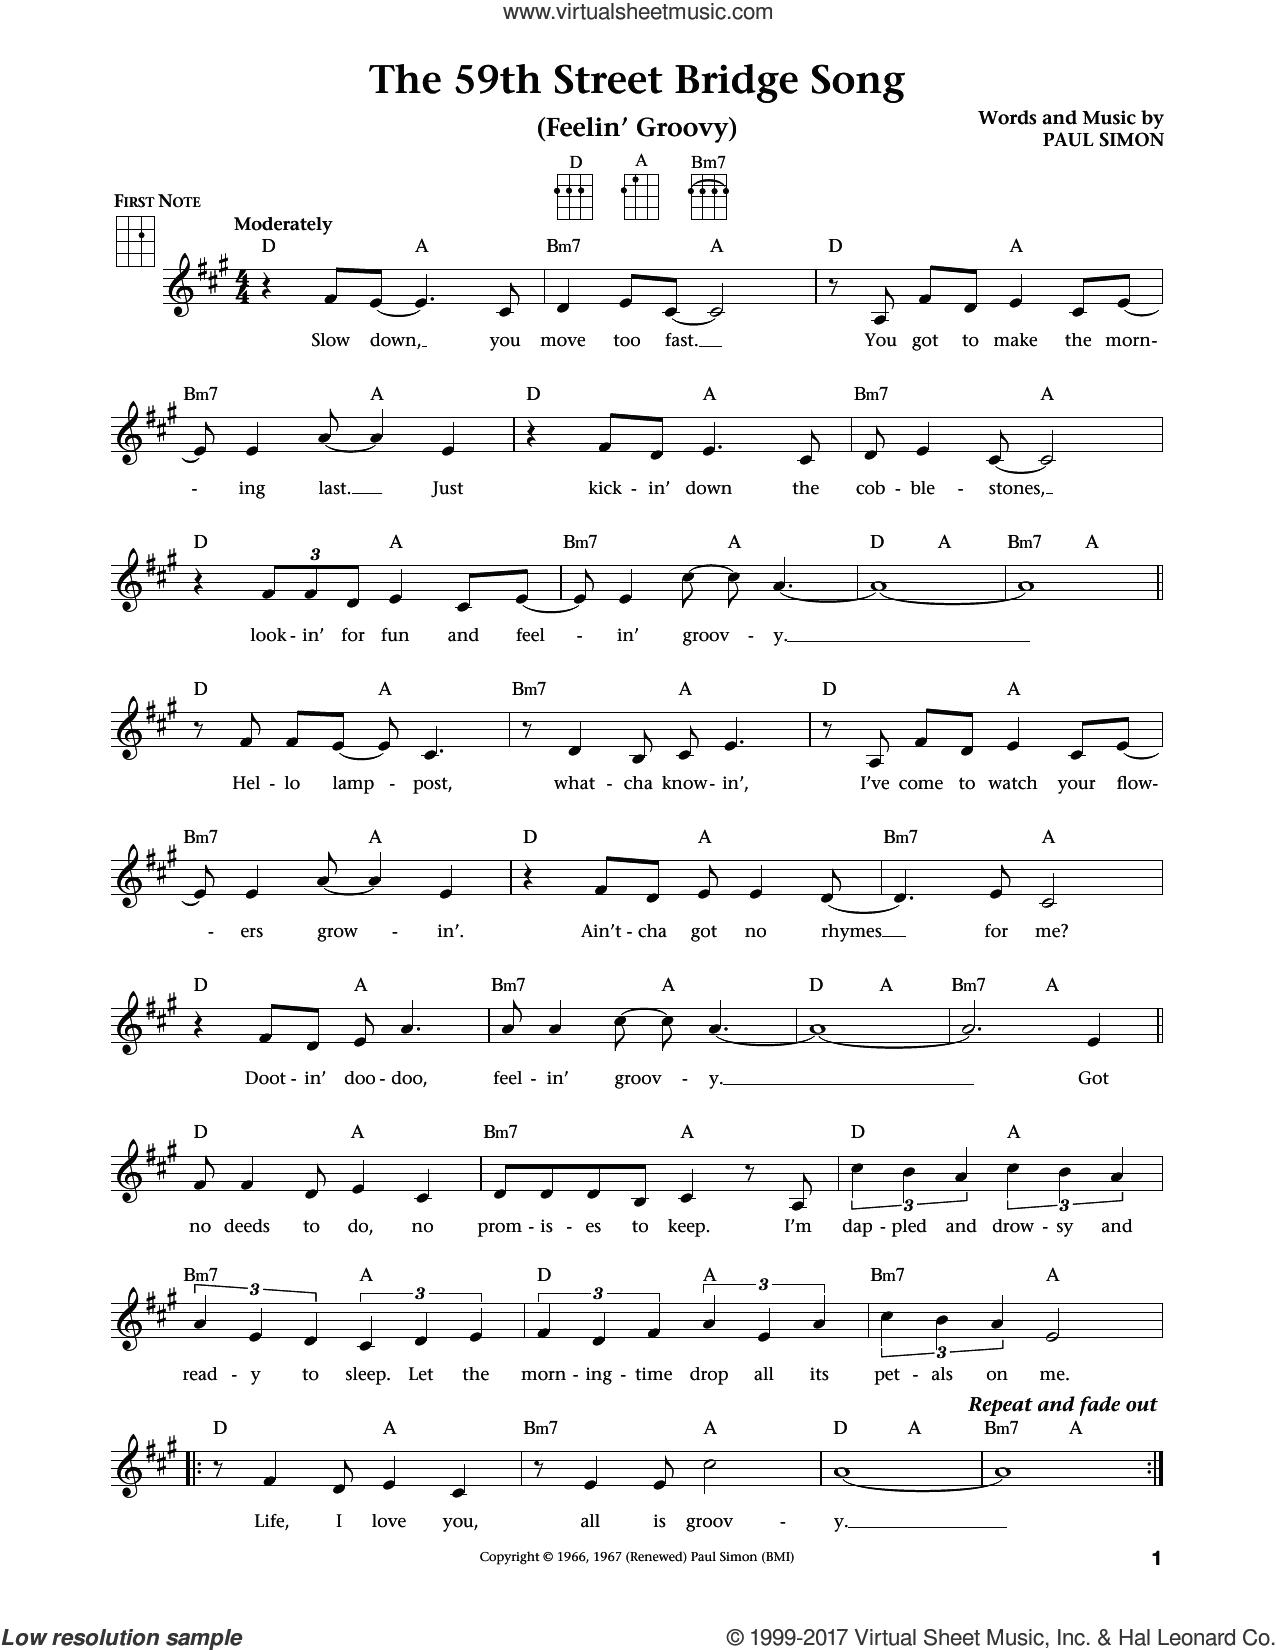 The 59th Street Bridge Song (Feelin' Groovy) (from The Daily Ukulele) (arr. Liz and Jim Beloff) sheet music for ukulele by Simon & Garfunkel, Jim Beloff, Liz Beloff and Paul Simon, intermediate skill level